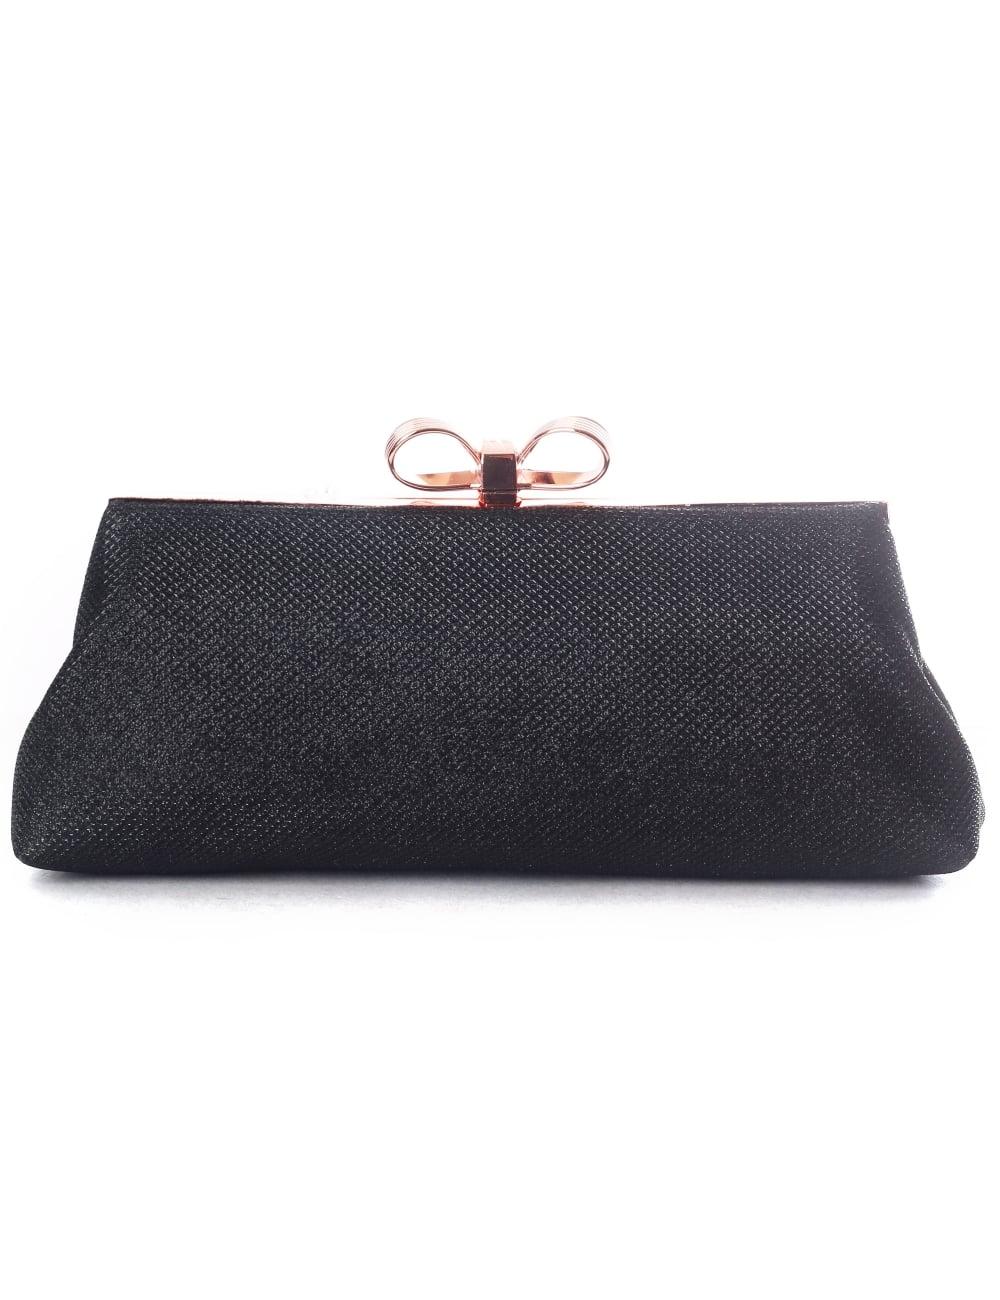 296b0e49af Ted Baker Iirene Glitter Bow Women s Evening Bag